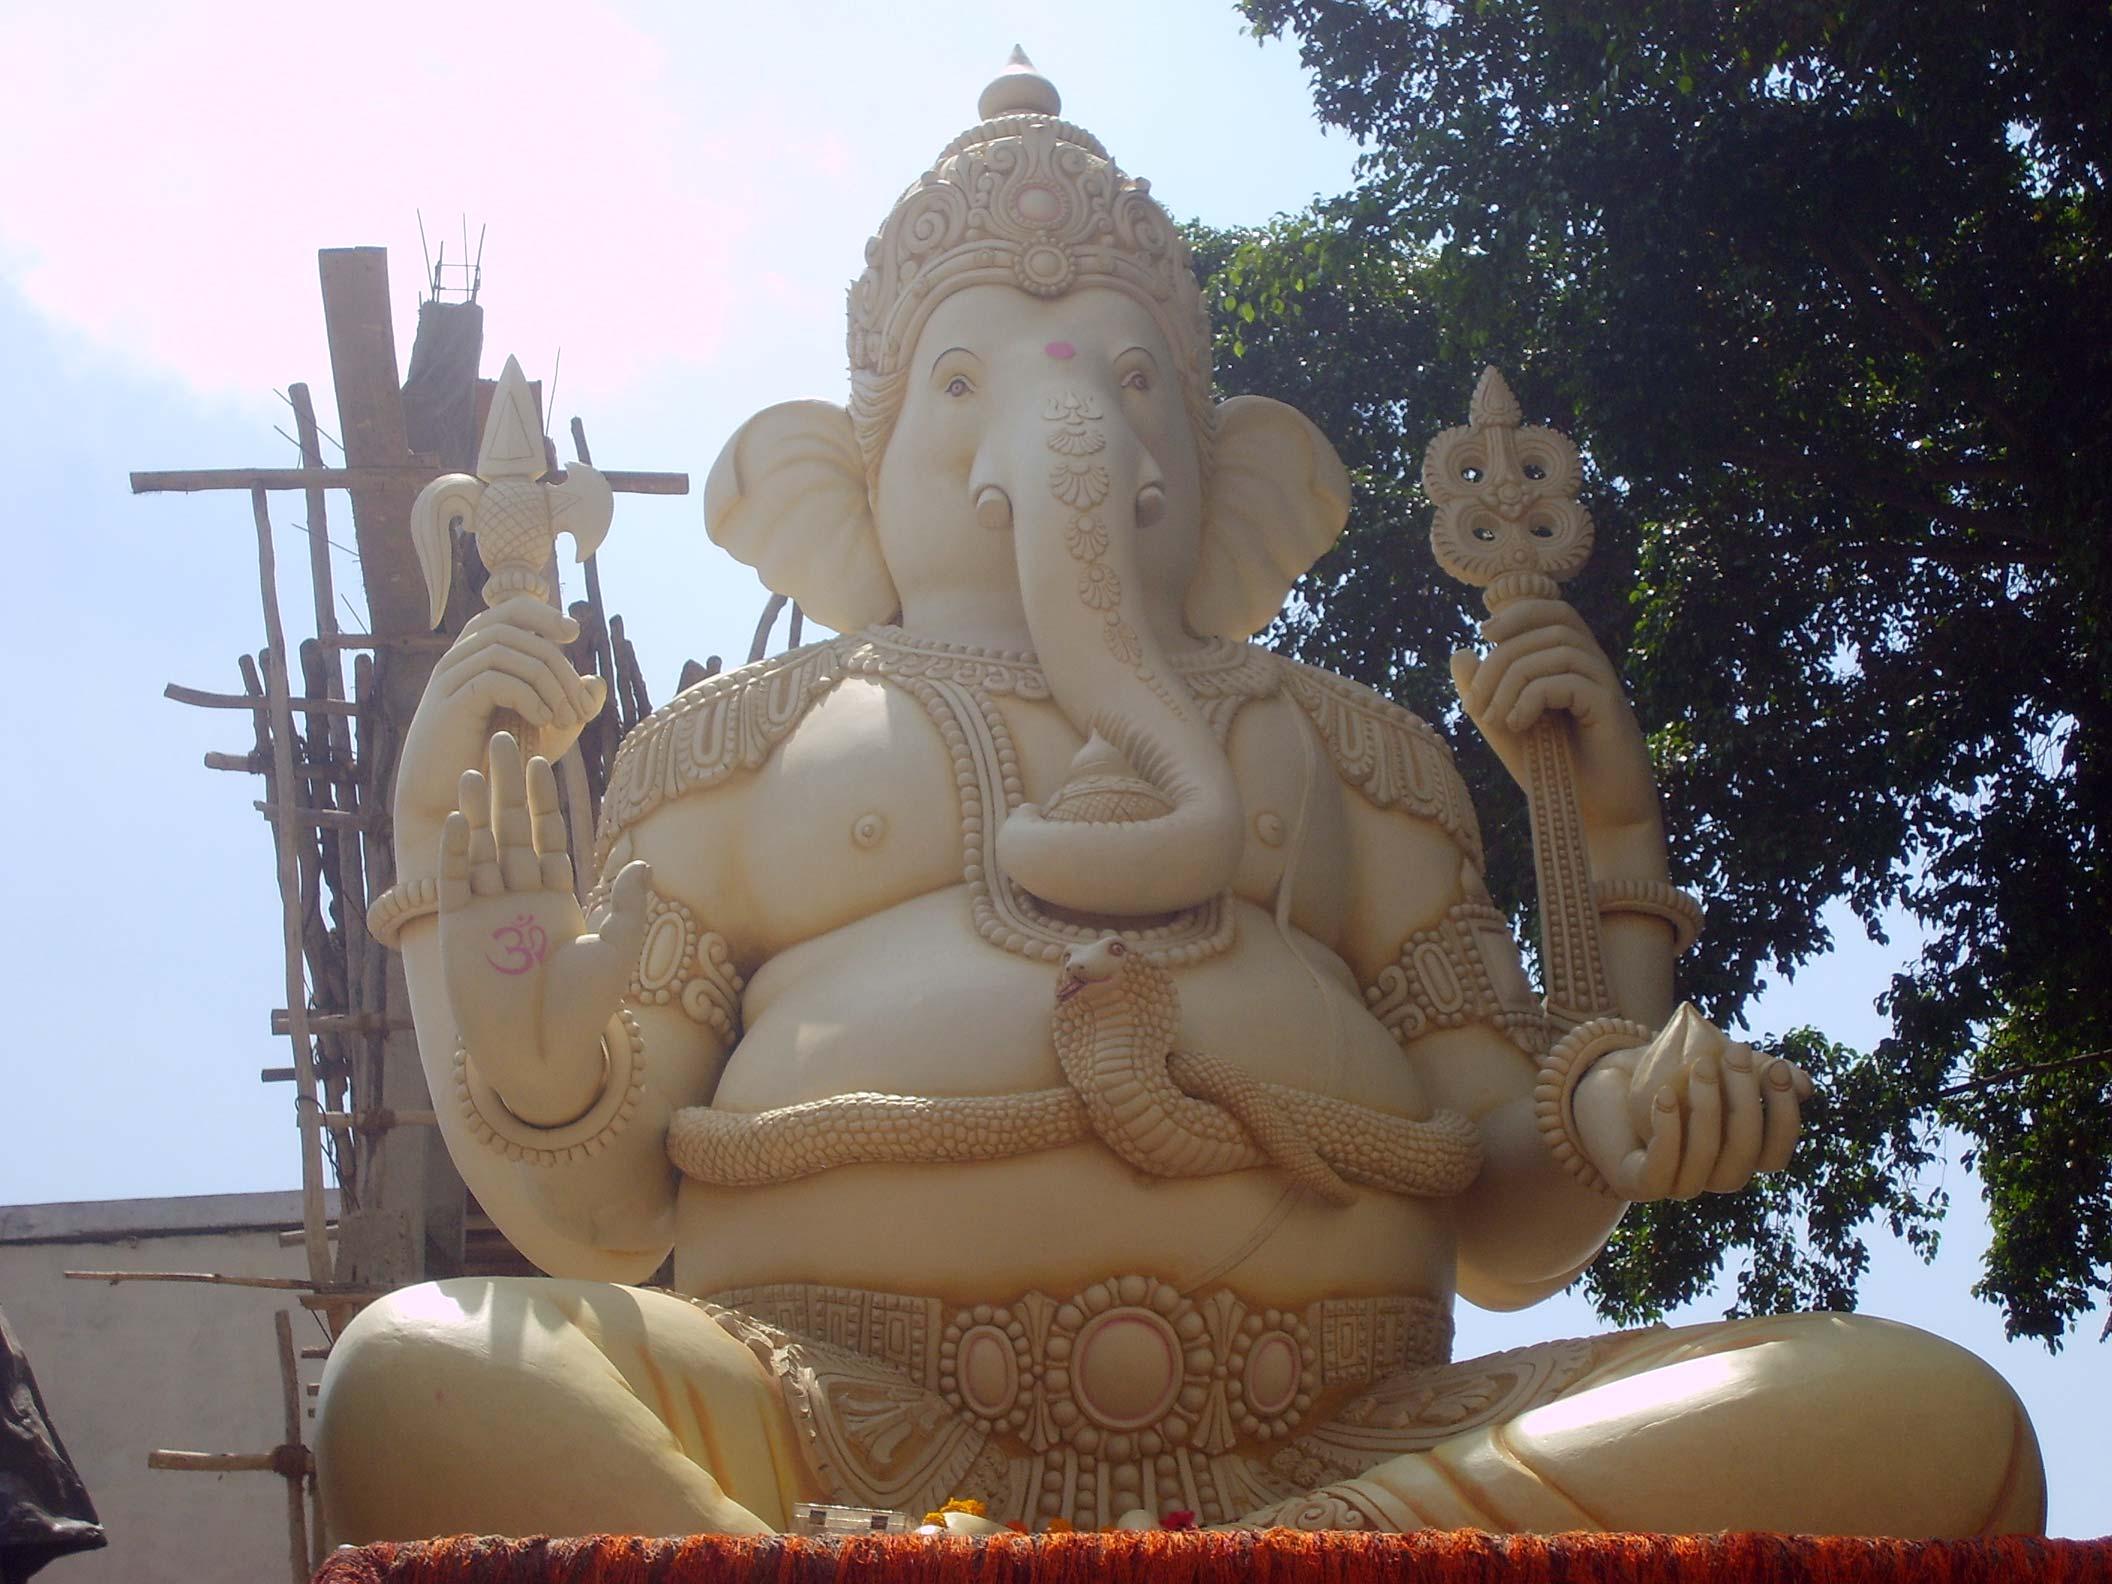 http://scriptures.ru/india/karnataka/bangalore/ganesha_kemp_fort002.jpg